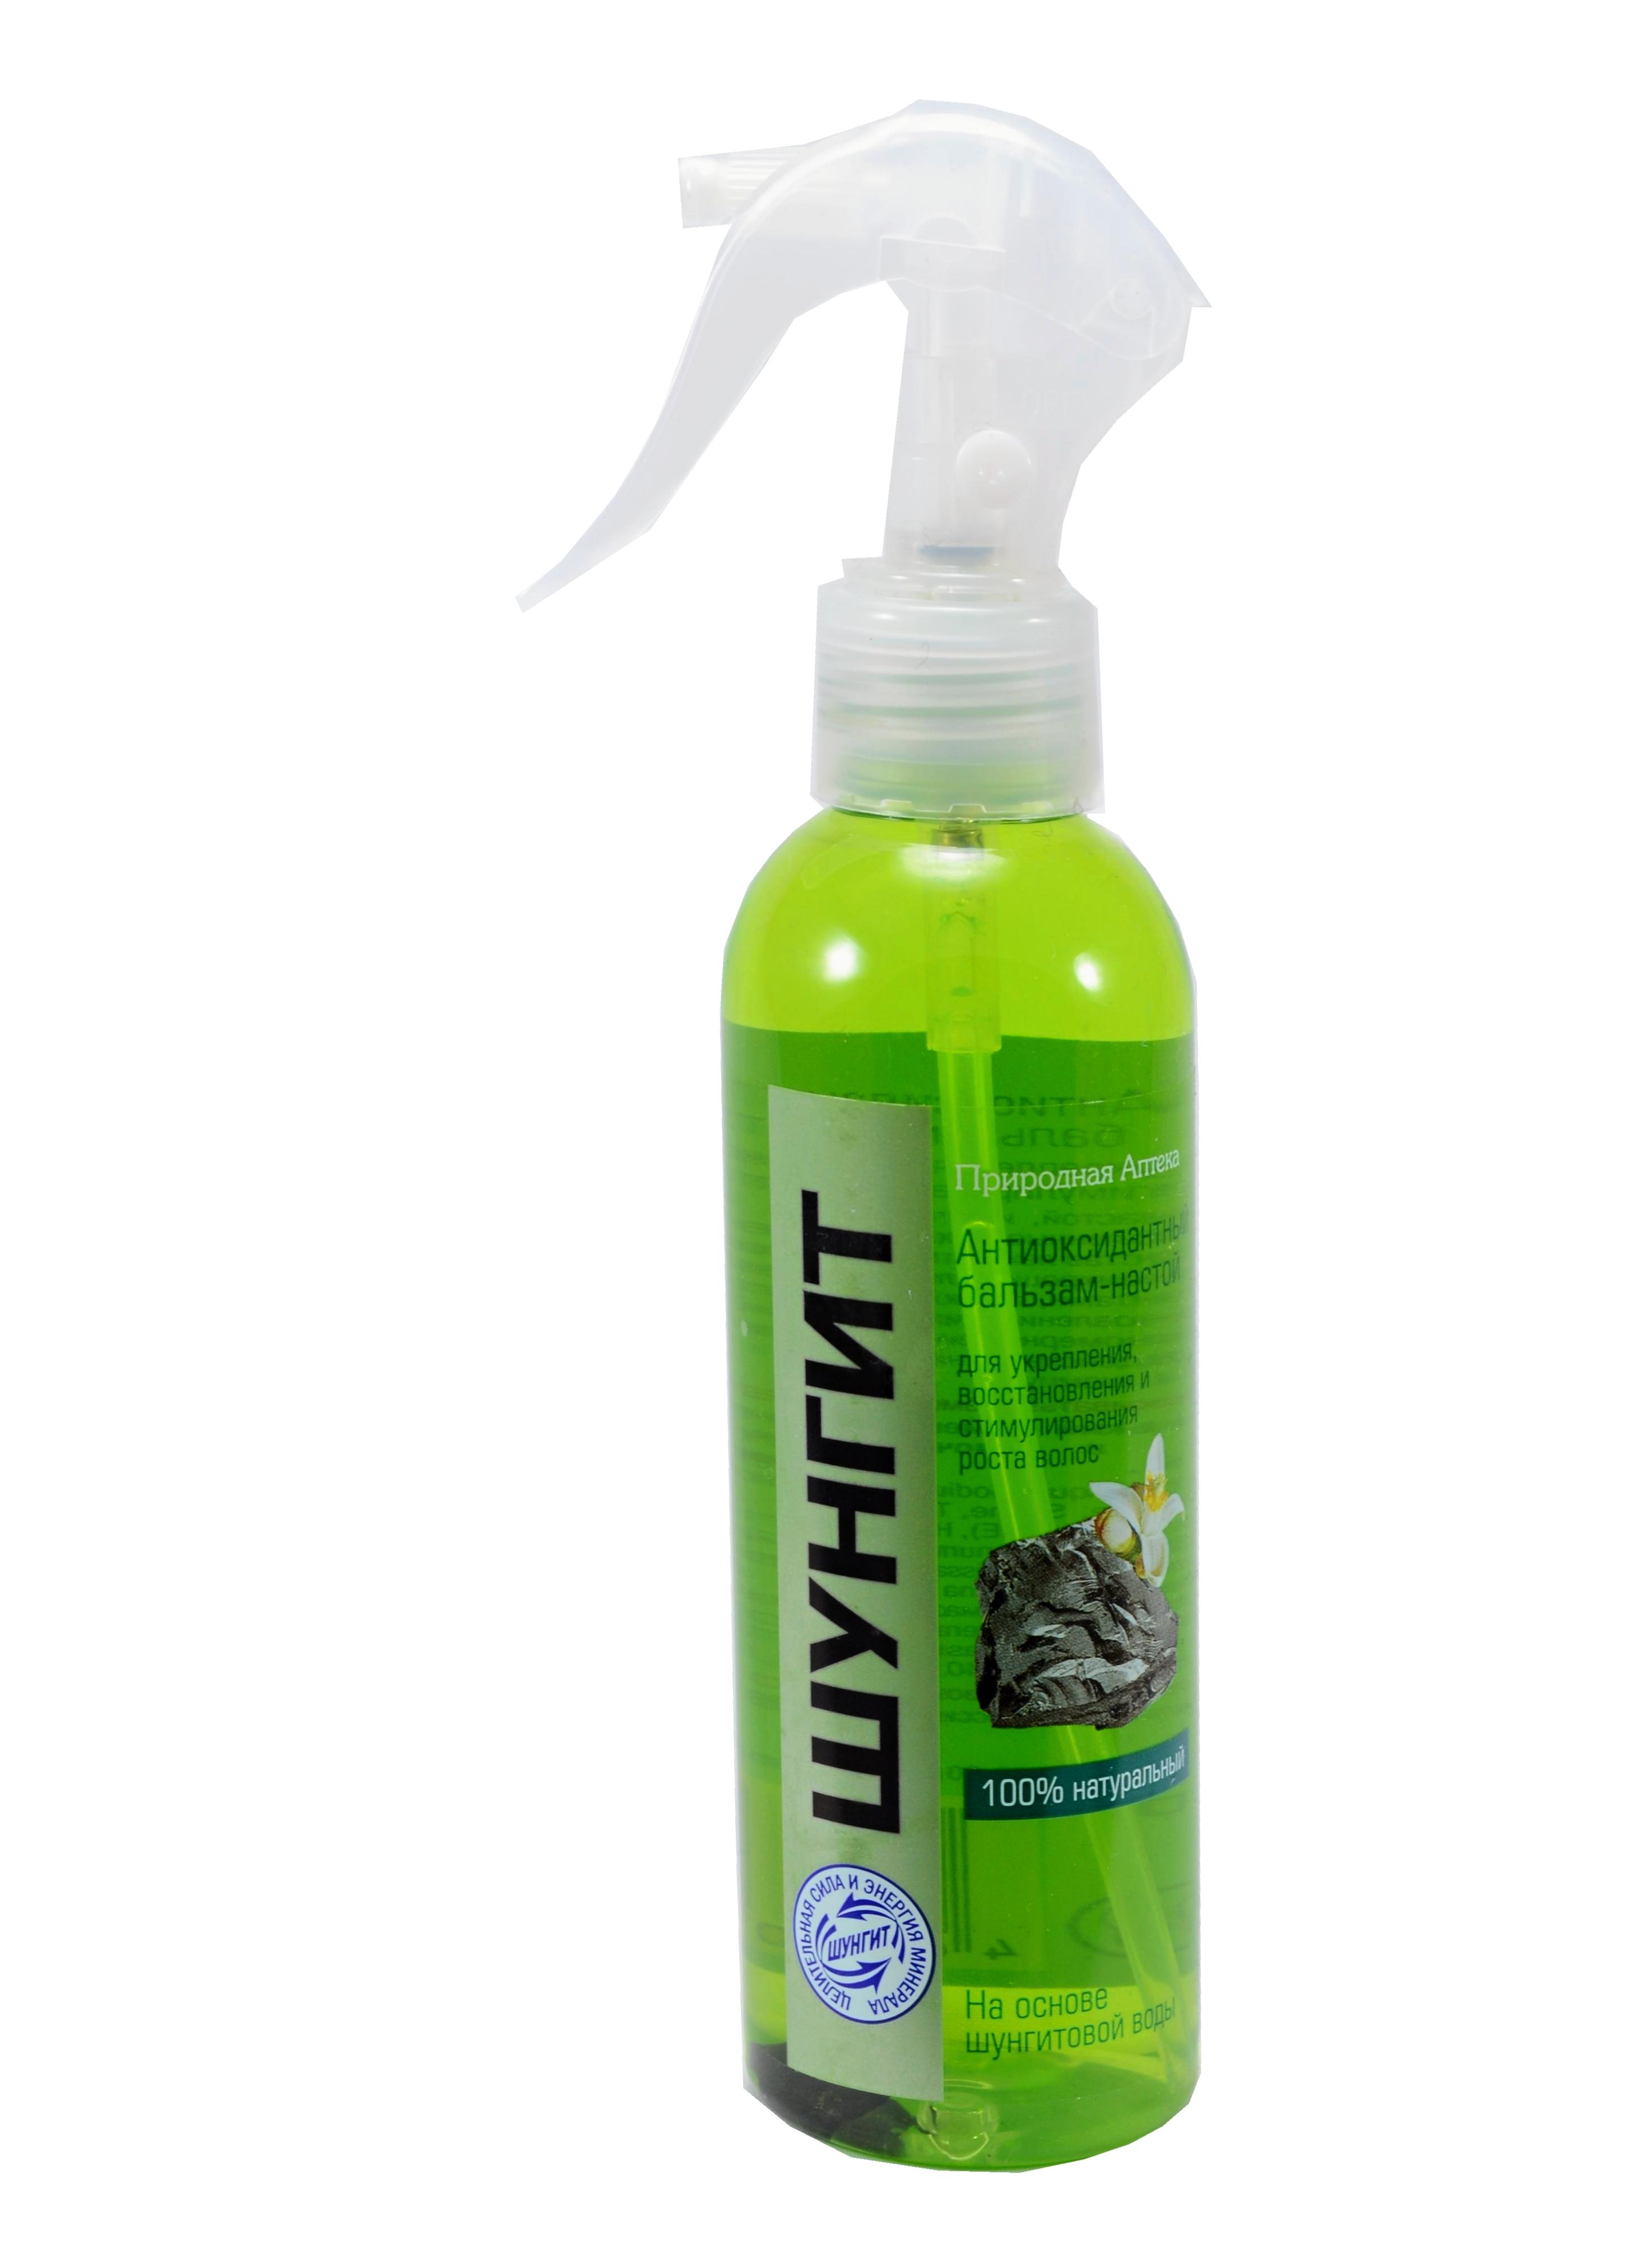 Šungitový balzam- extrakt na vlasy ANTIOXIDANT - Fratti - 200ml